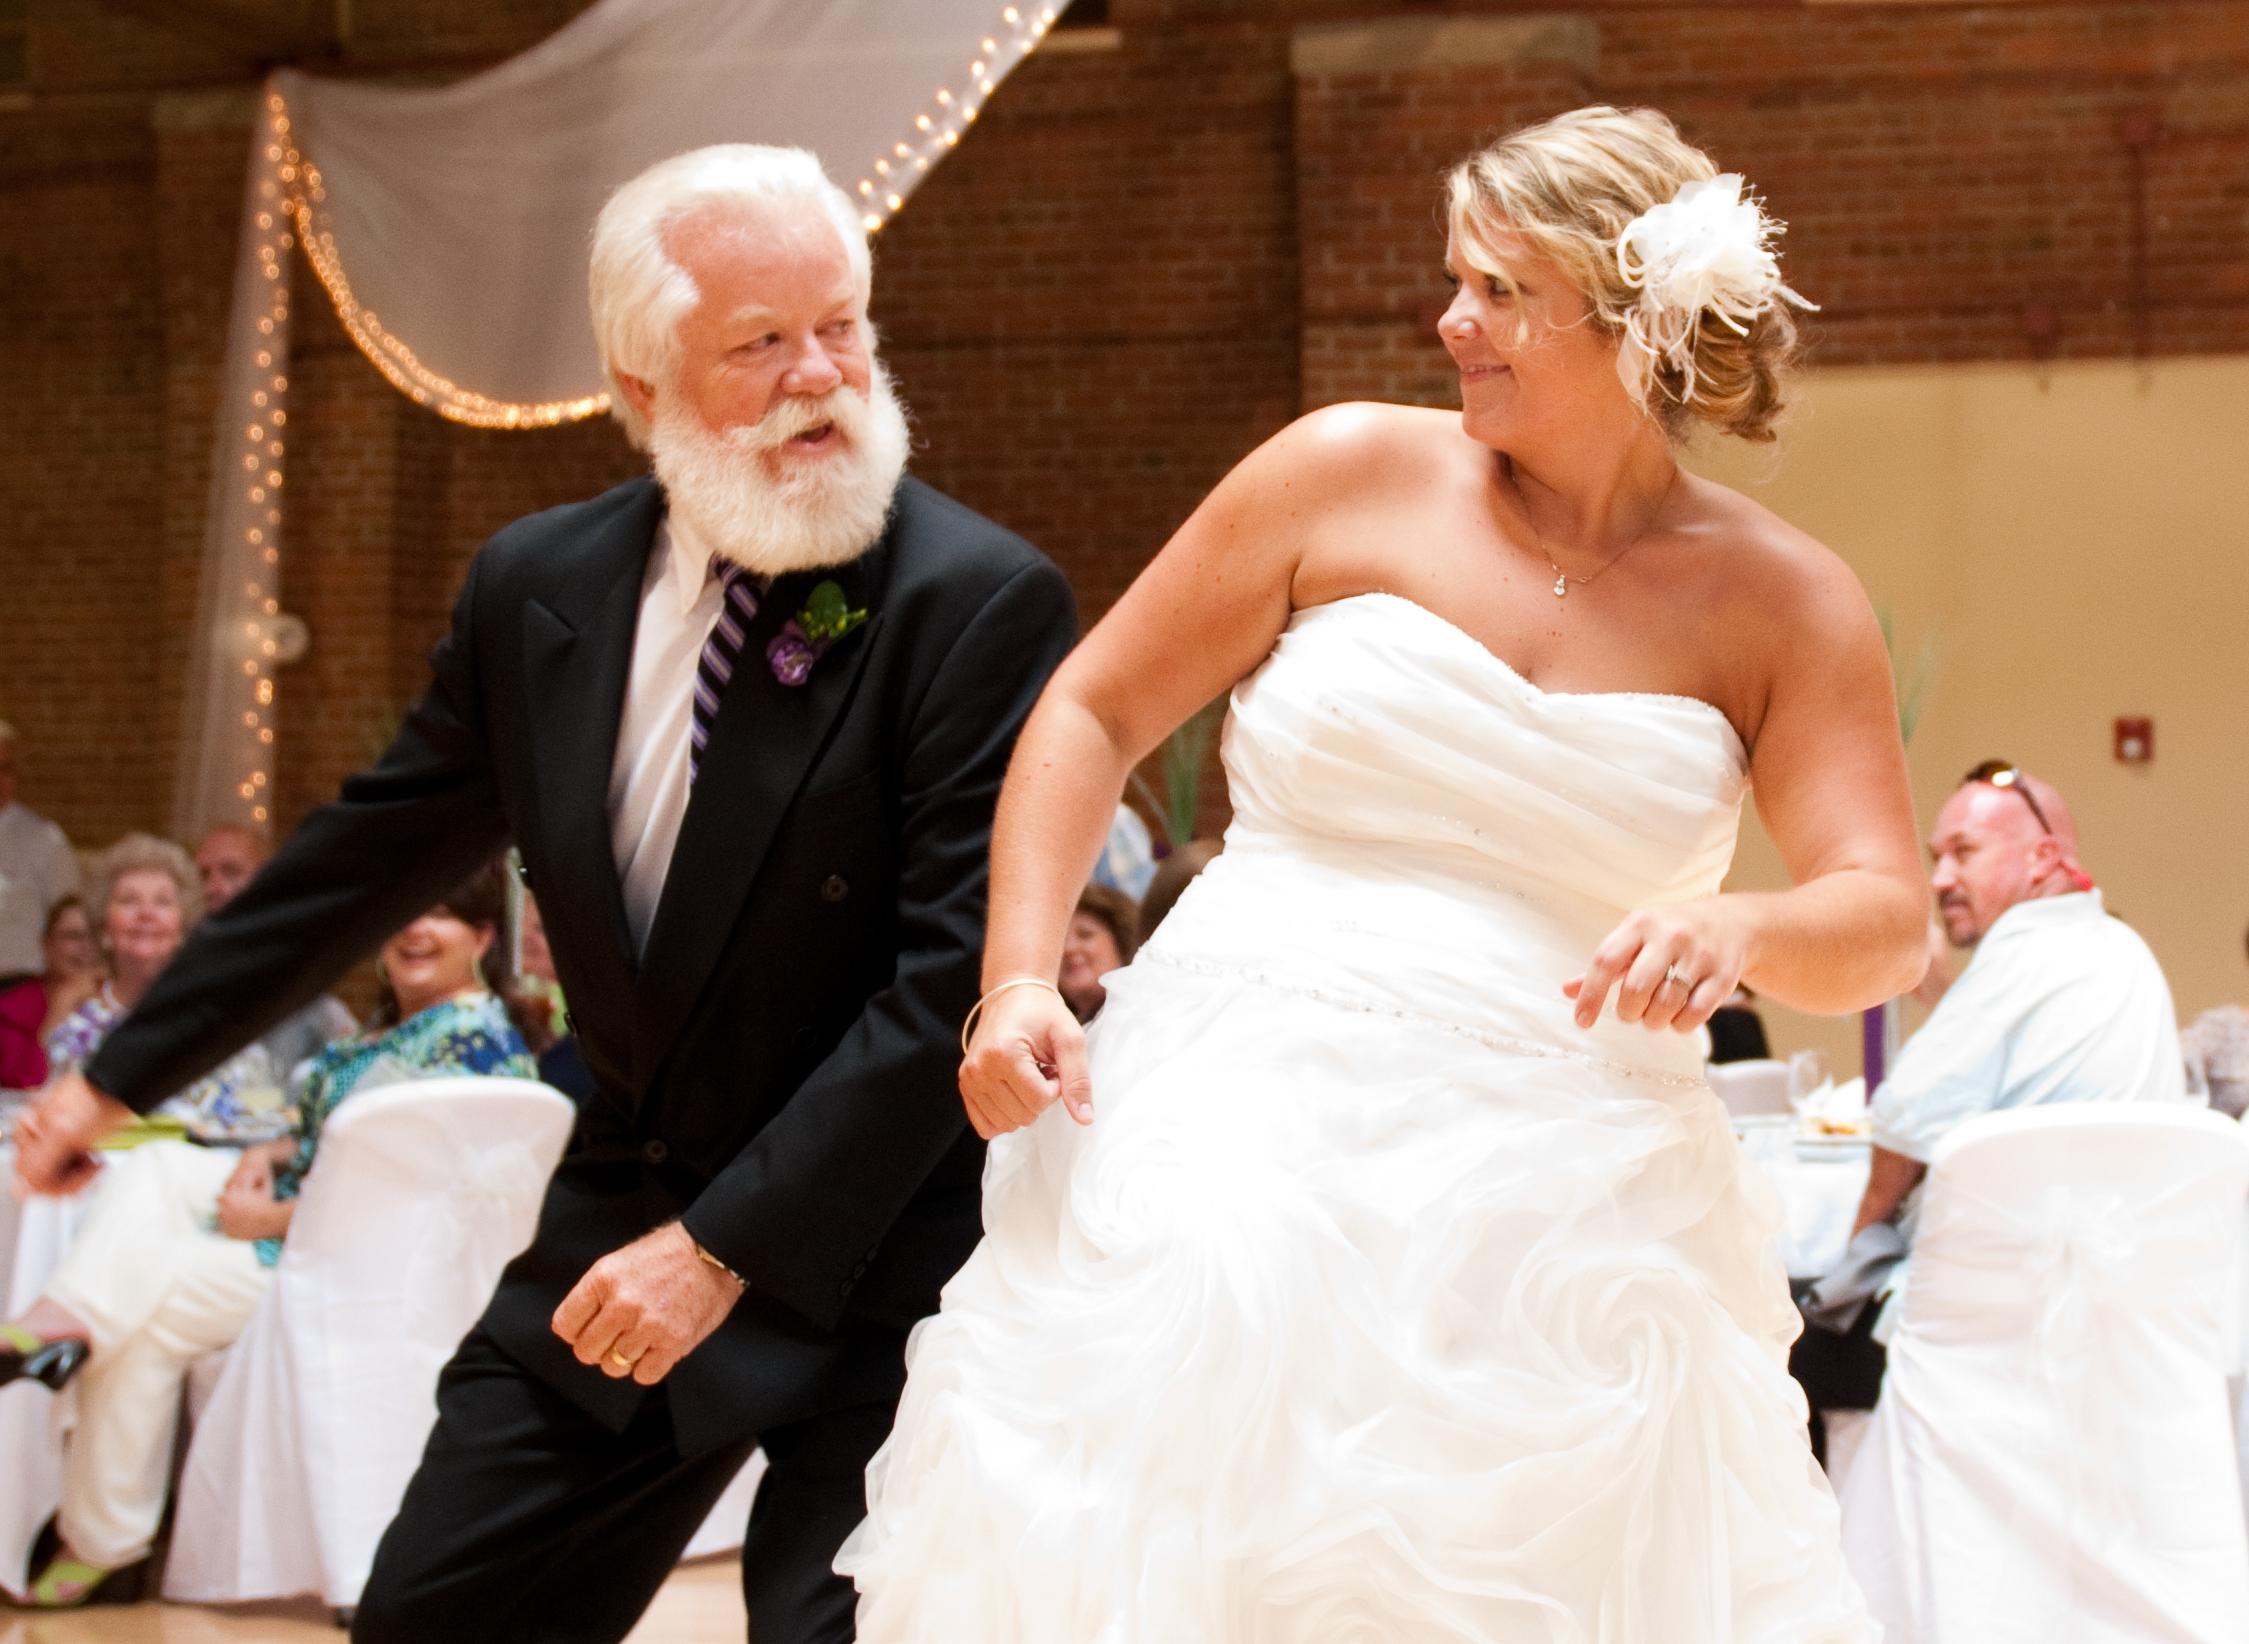 wedding party dances idodances